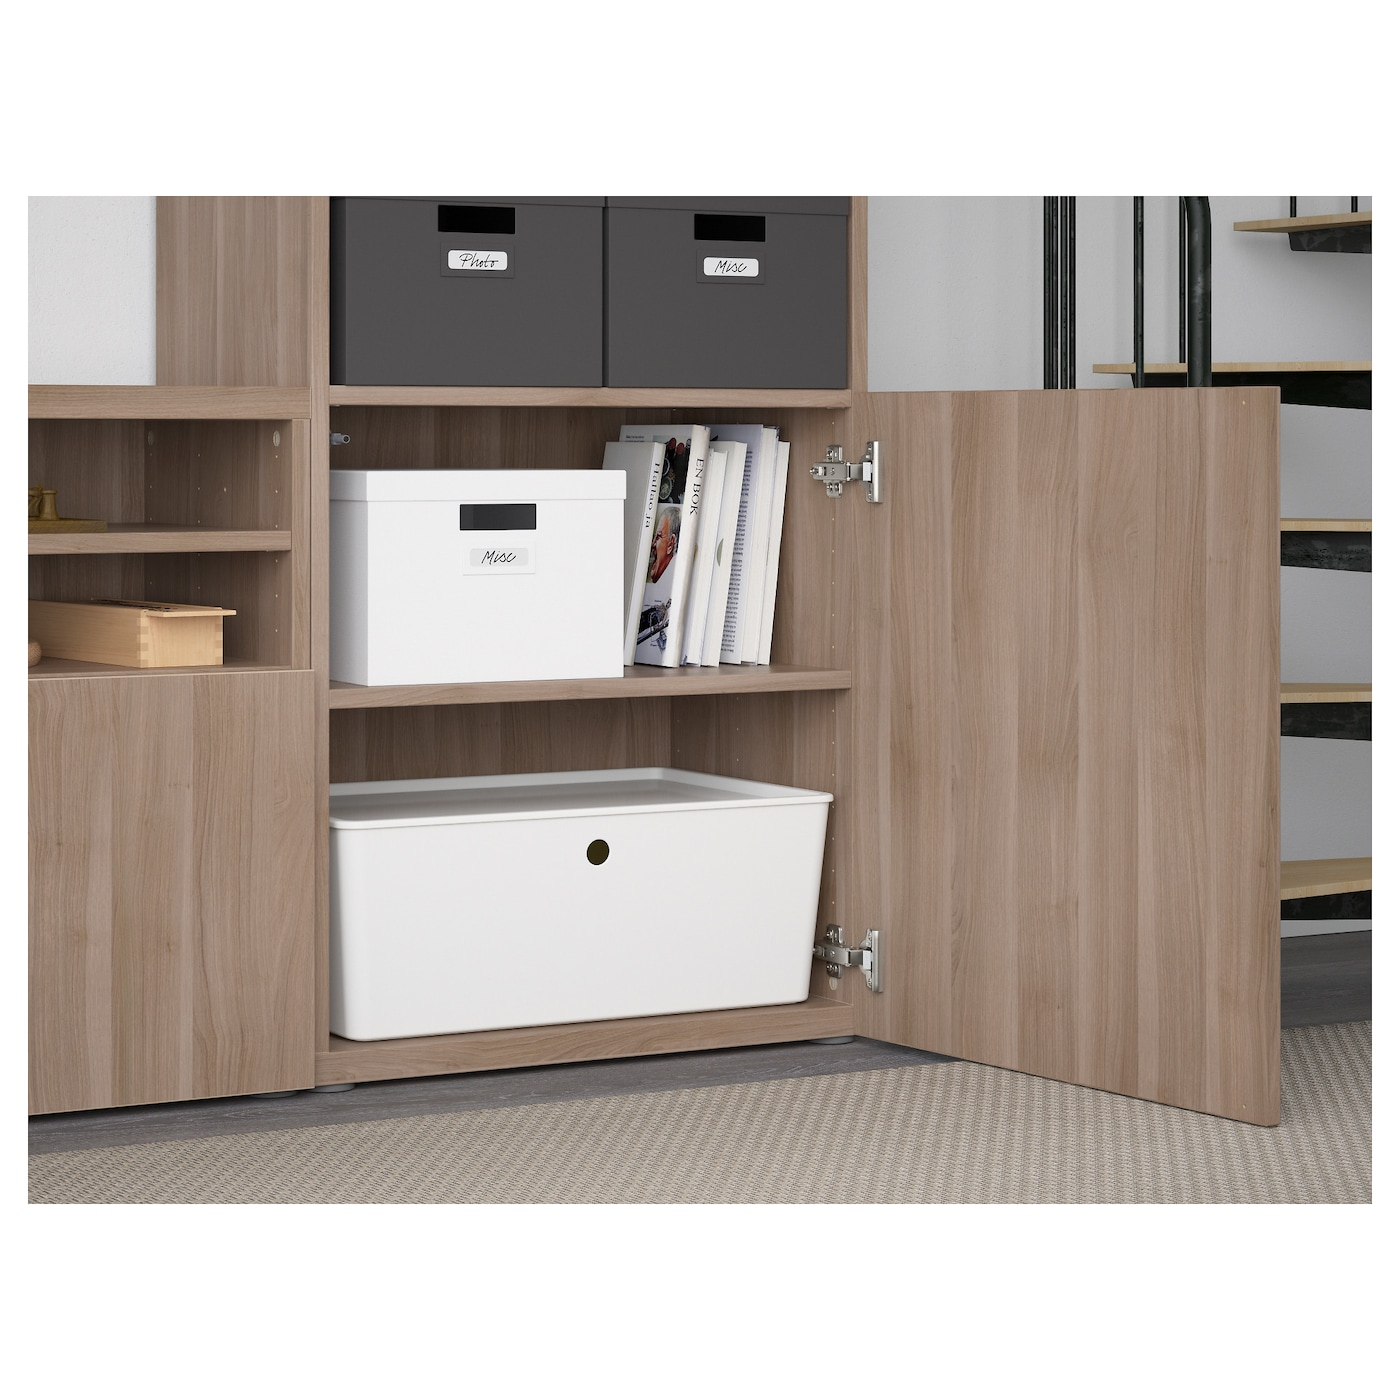 Best mueble tv con almacenaje lappviken sindvik efecto nogal tinte gr vdr transp 300 x 40 x 230 - Muebles almacenaje ikea ...